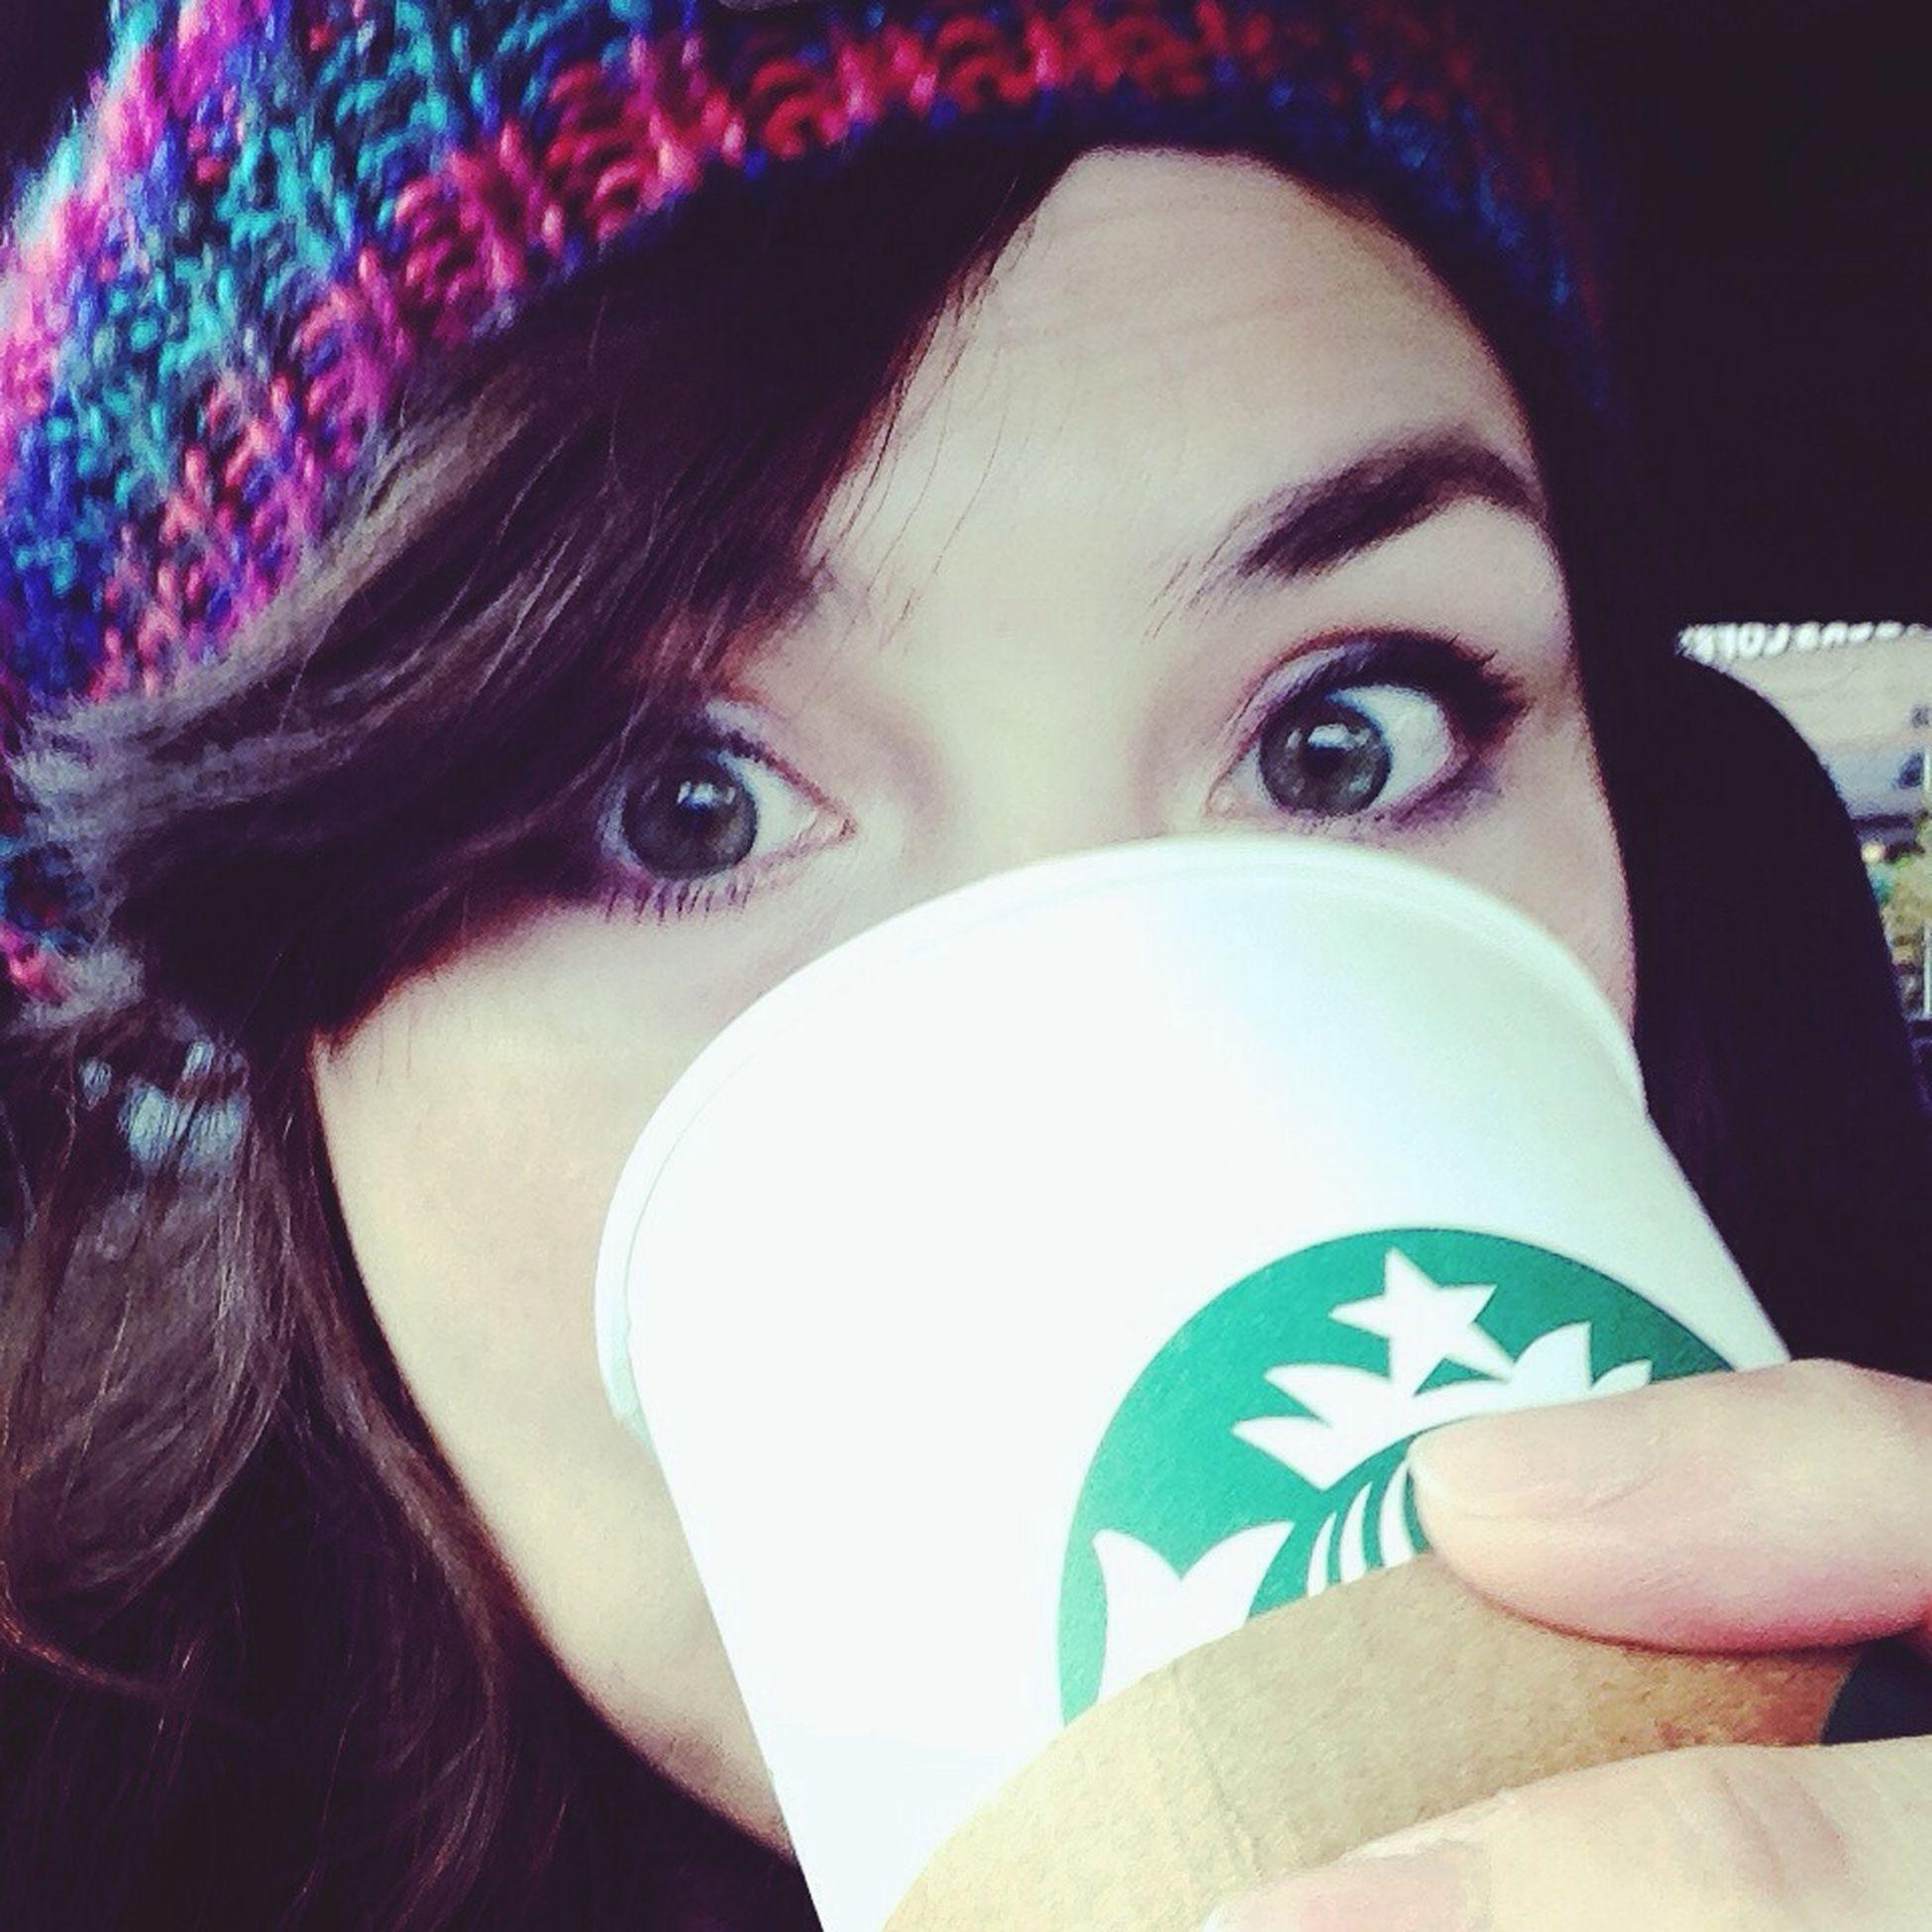 Coffee Coffeeeee! Starbucks Beaniedays Selfie ✌ C'EST MOI